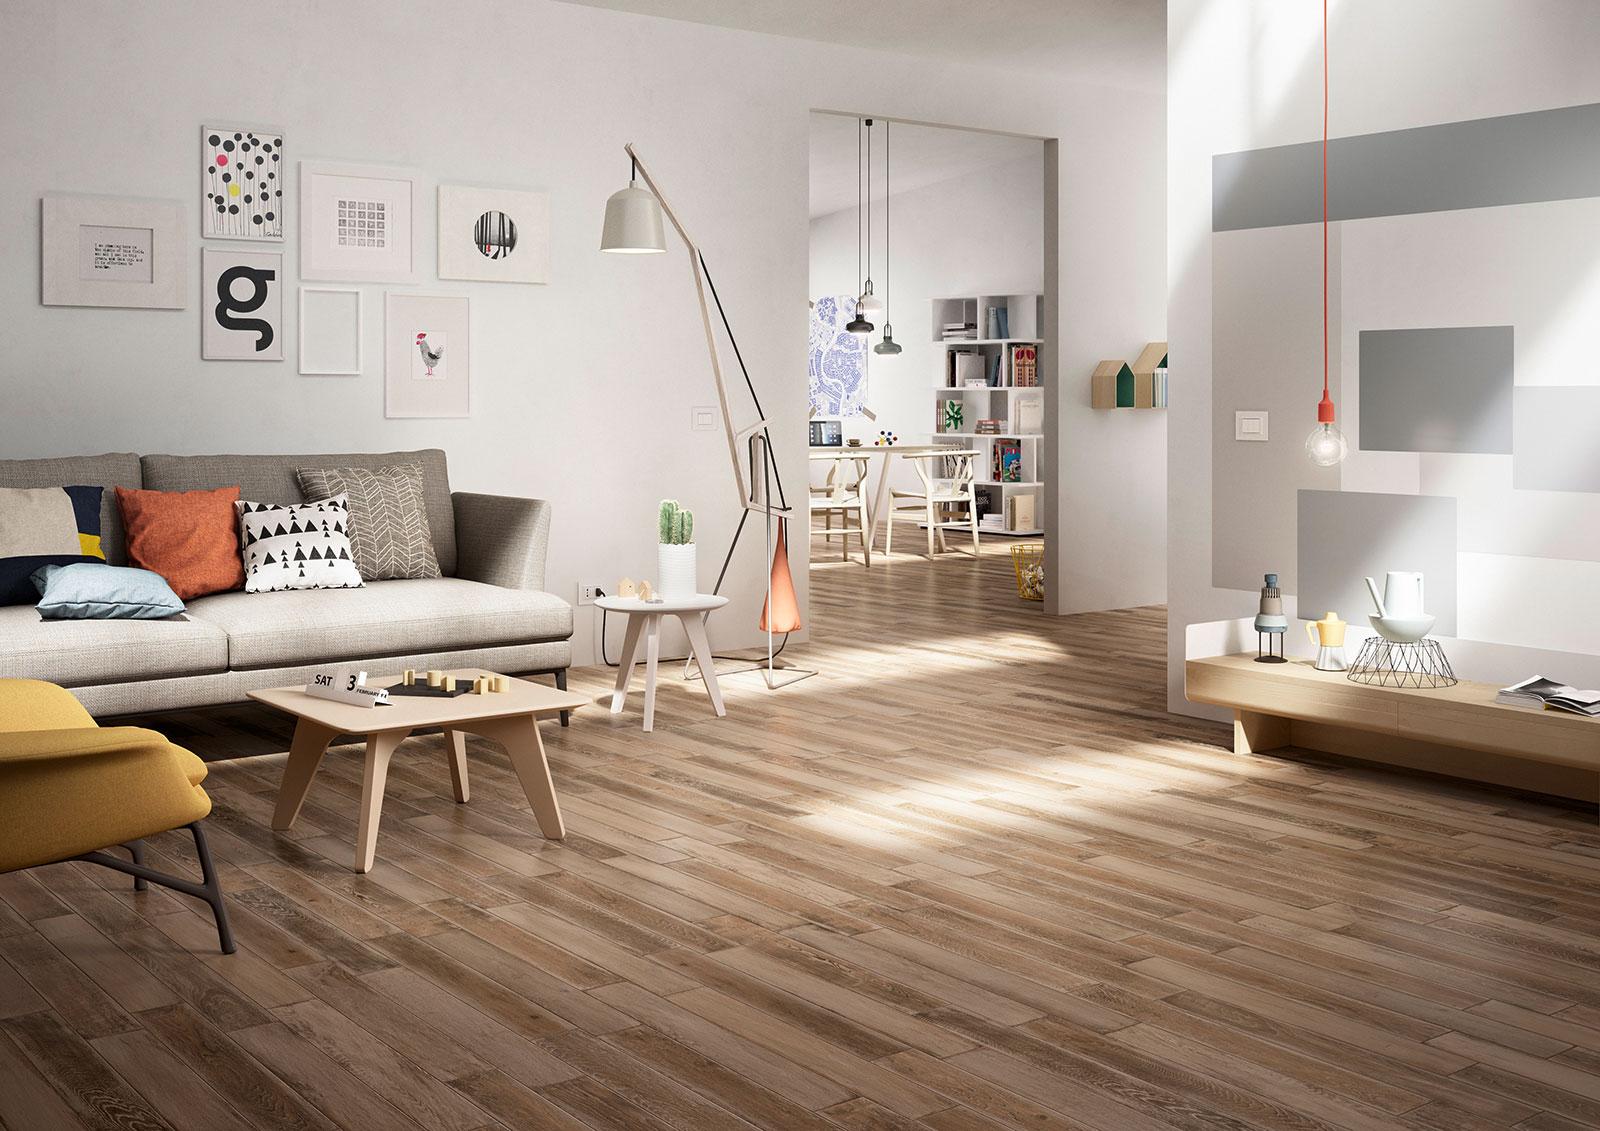 Treverkage gres imitaci n madera para pavimentos marazzi - Suelos imitacion madera ...